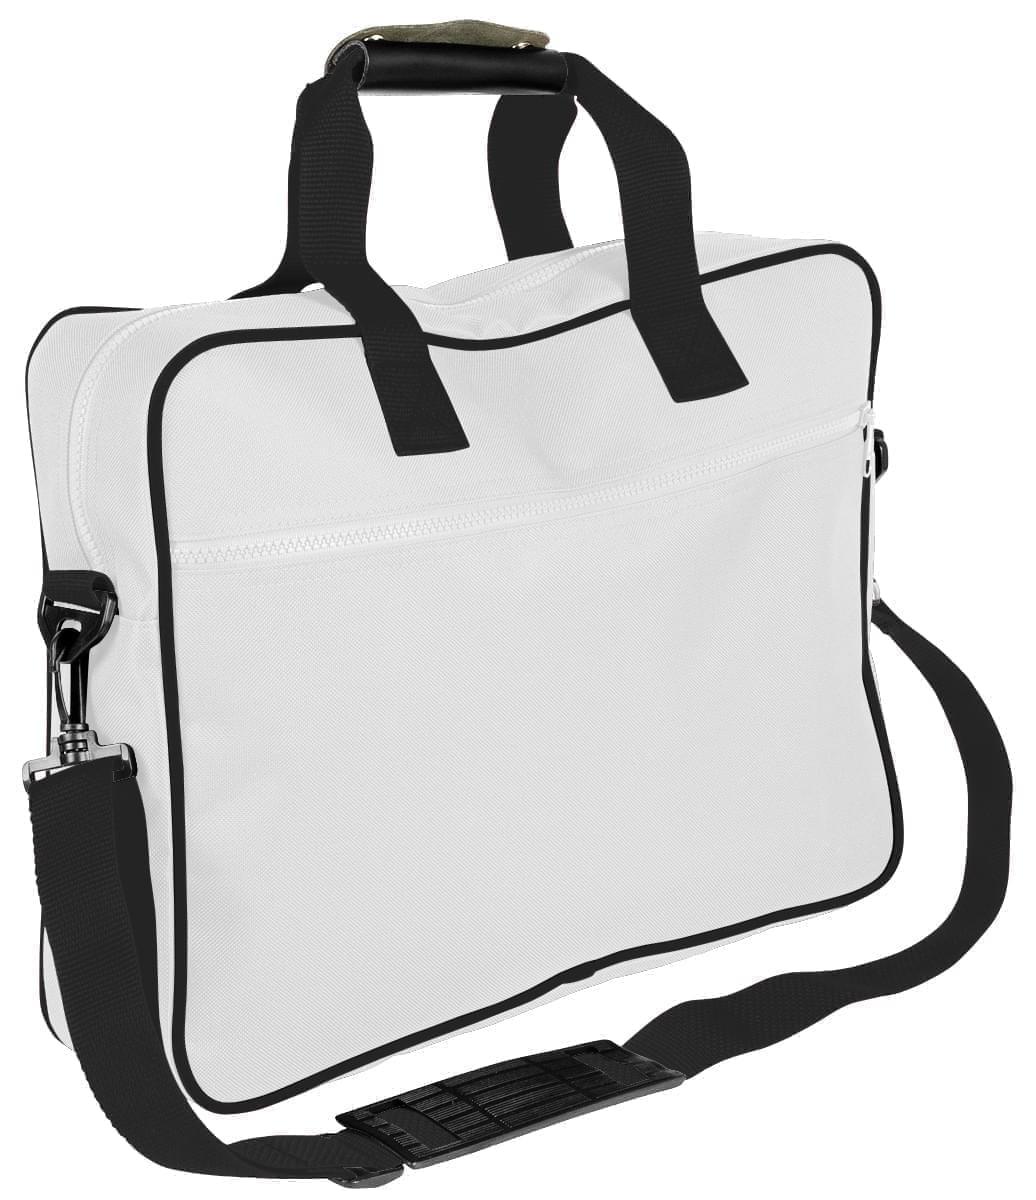 USA Made Nylon Poly Notebook Sleeves, White-Black, CPKVA59P3R